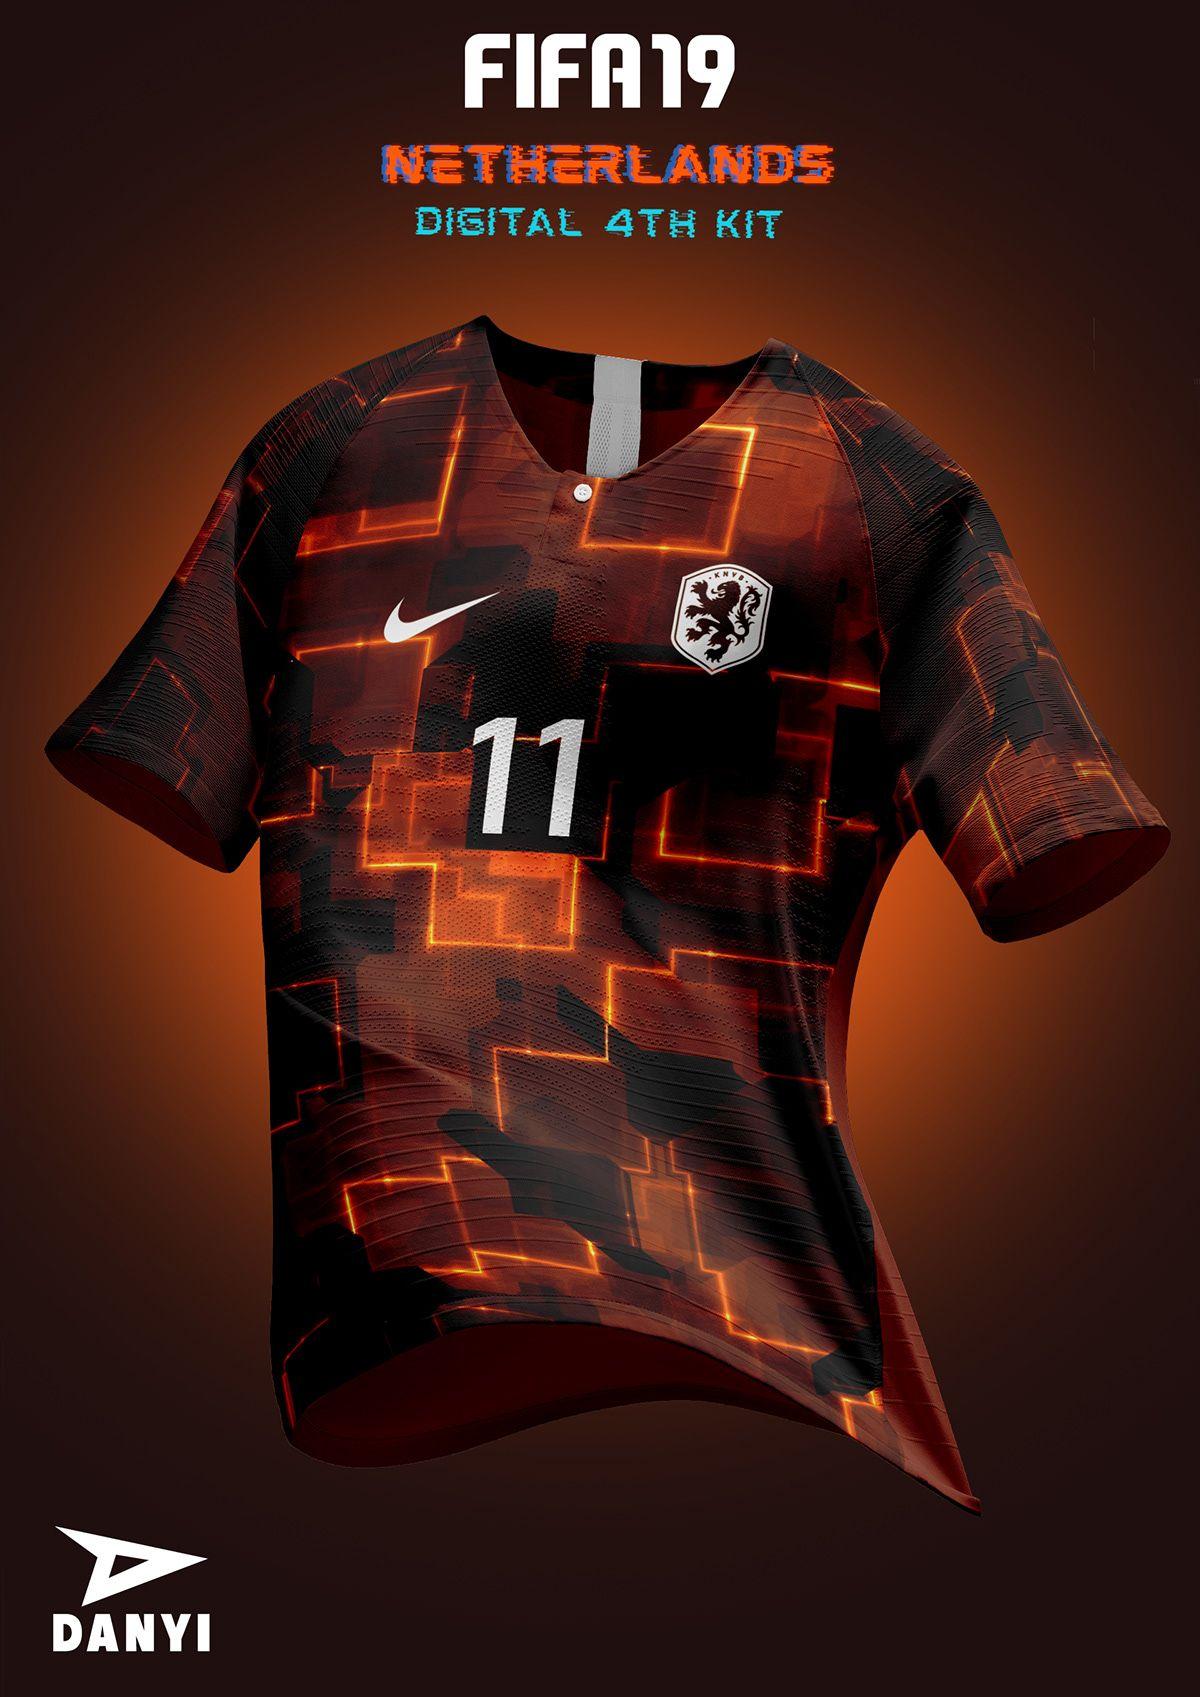 Fifa 19 X Nike Football Kits On Behance Camisetas De Futebol